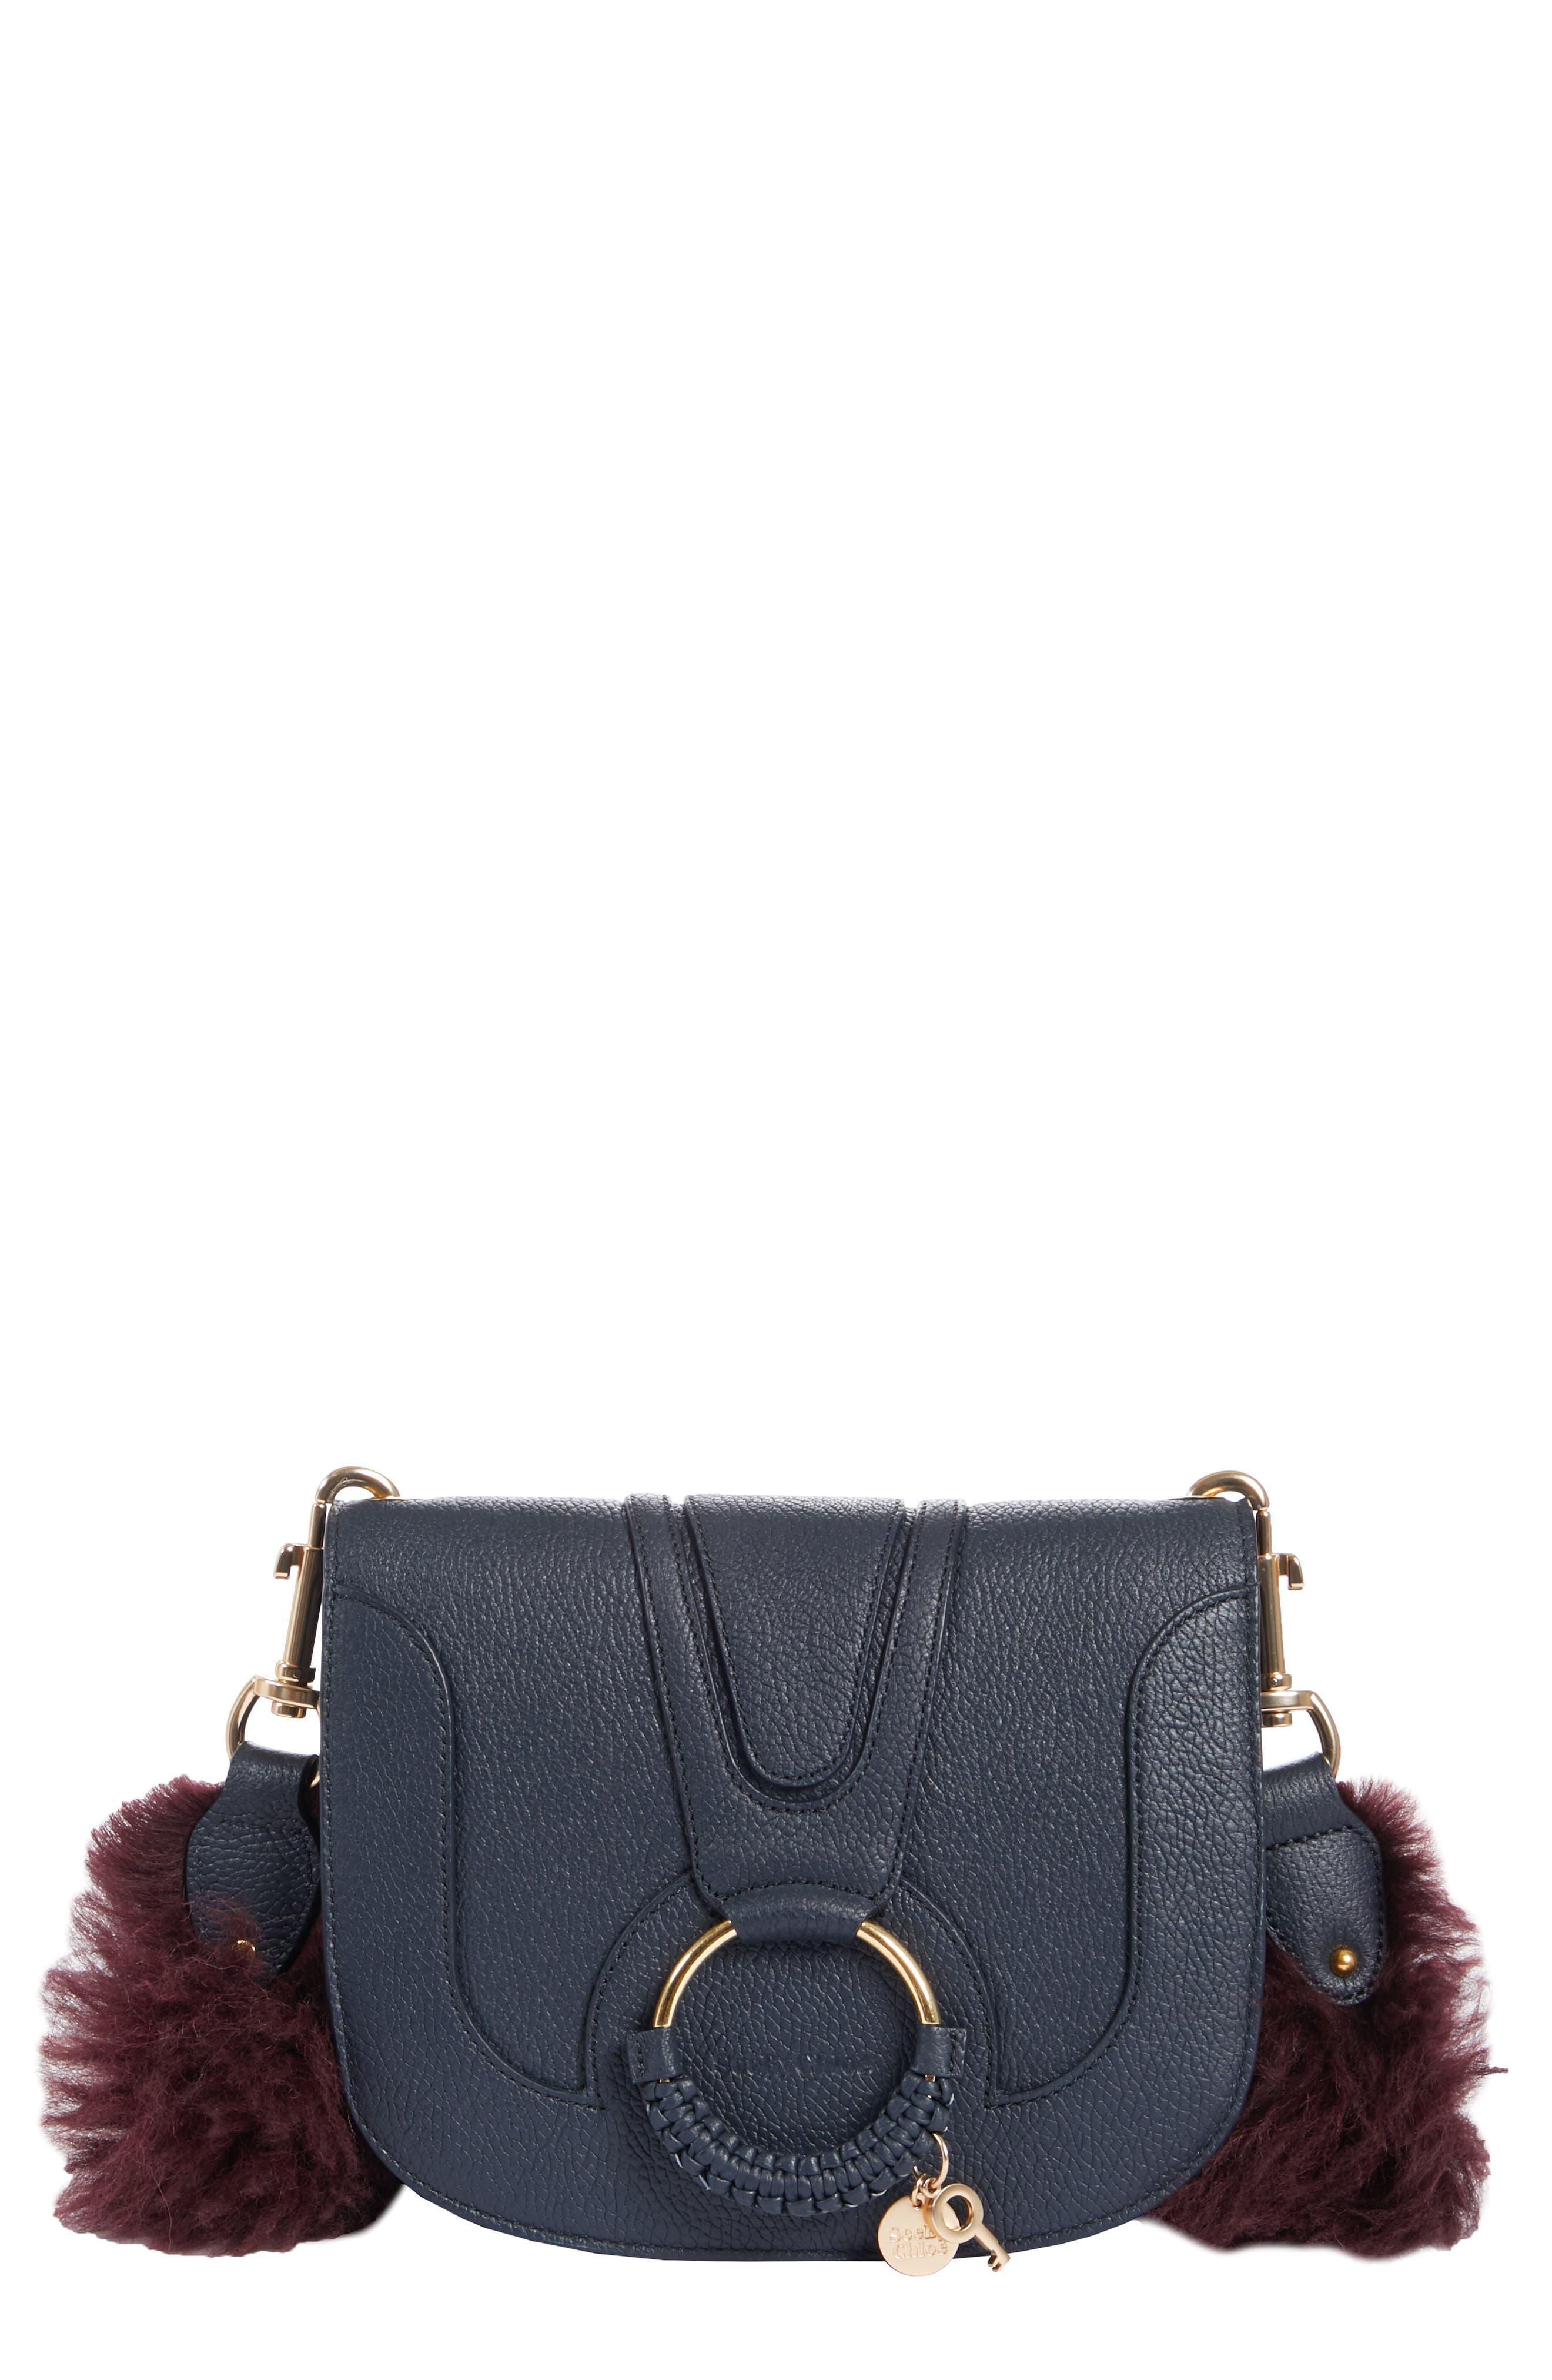 Hana Leather Shoulder Bag,                             Main thumbnail 1, color,                             401